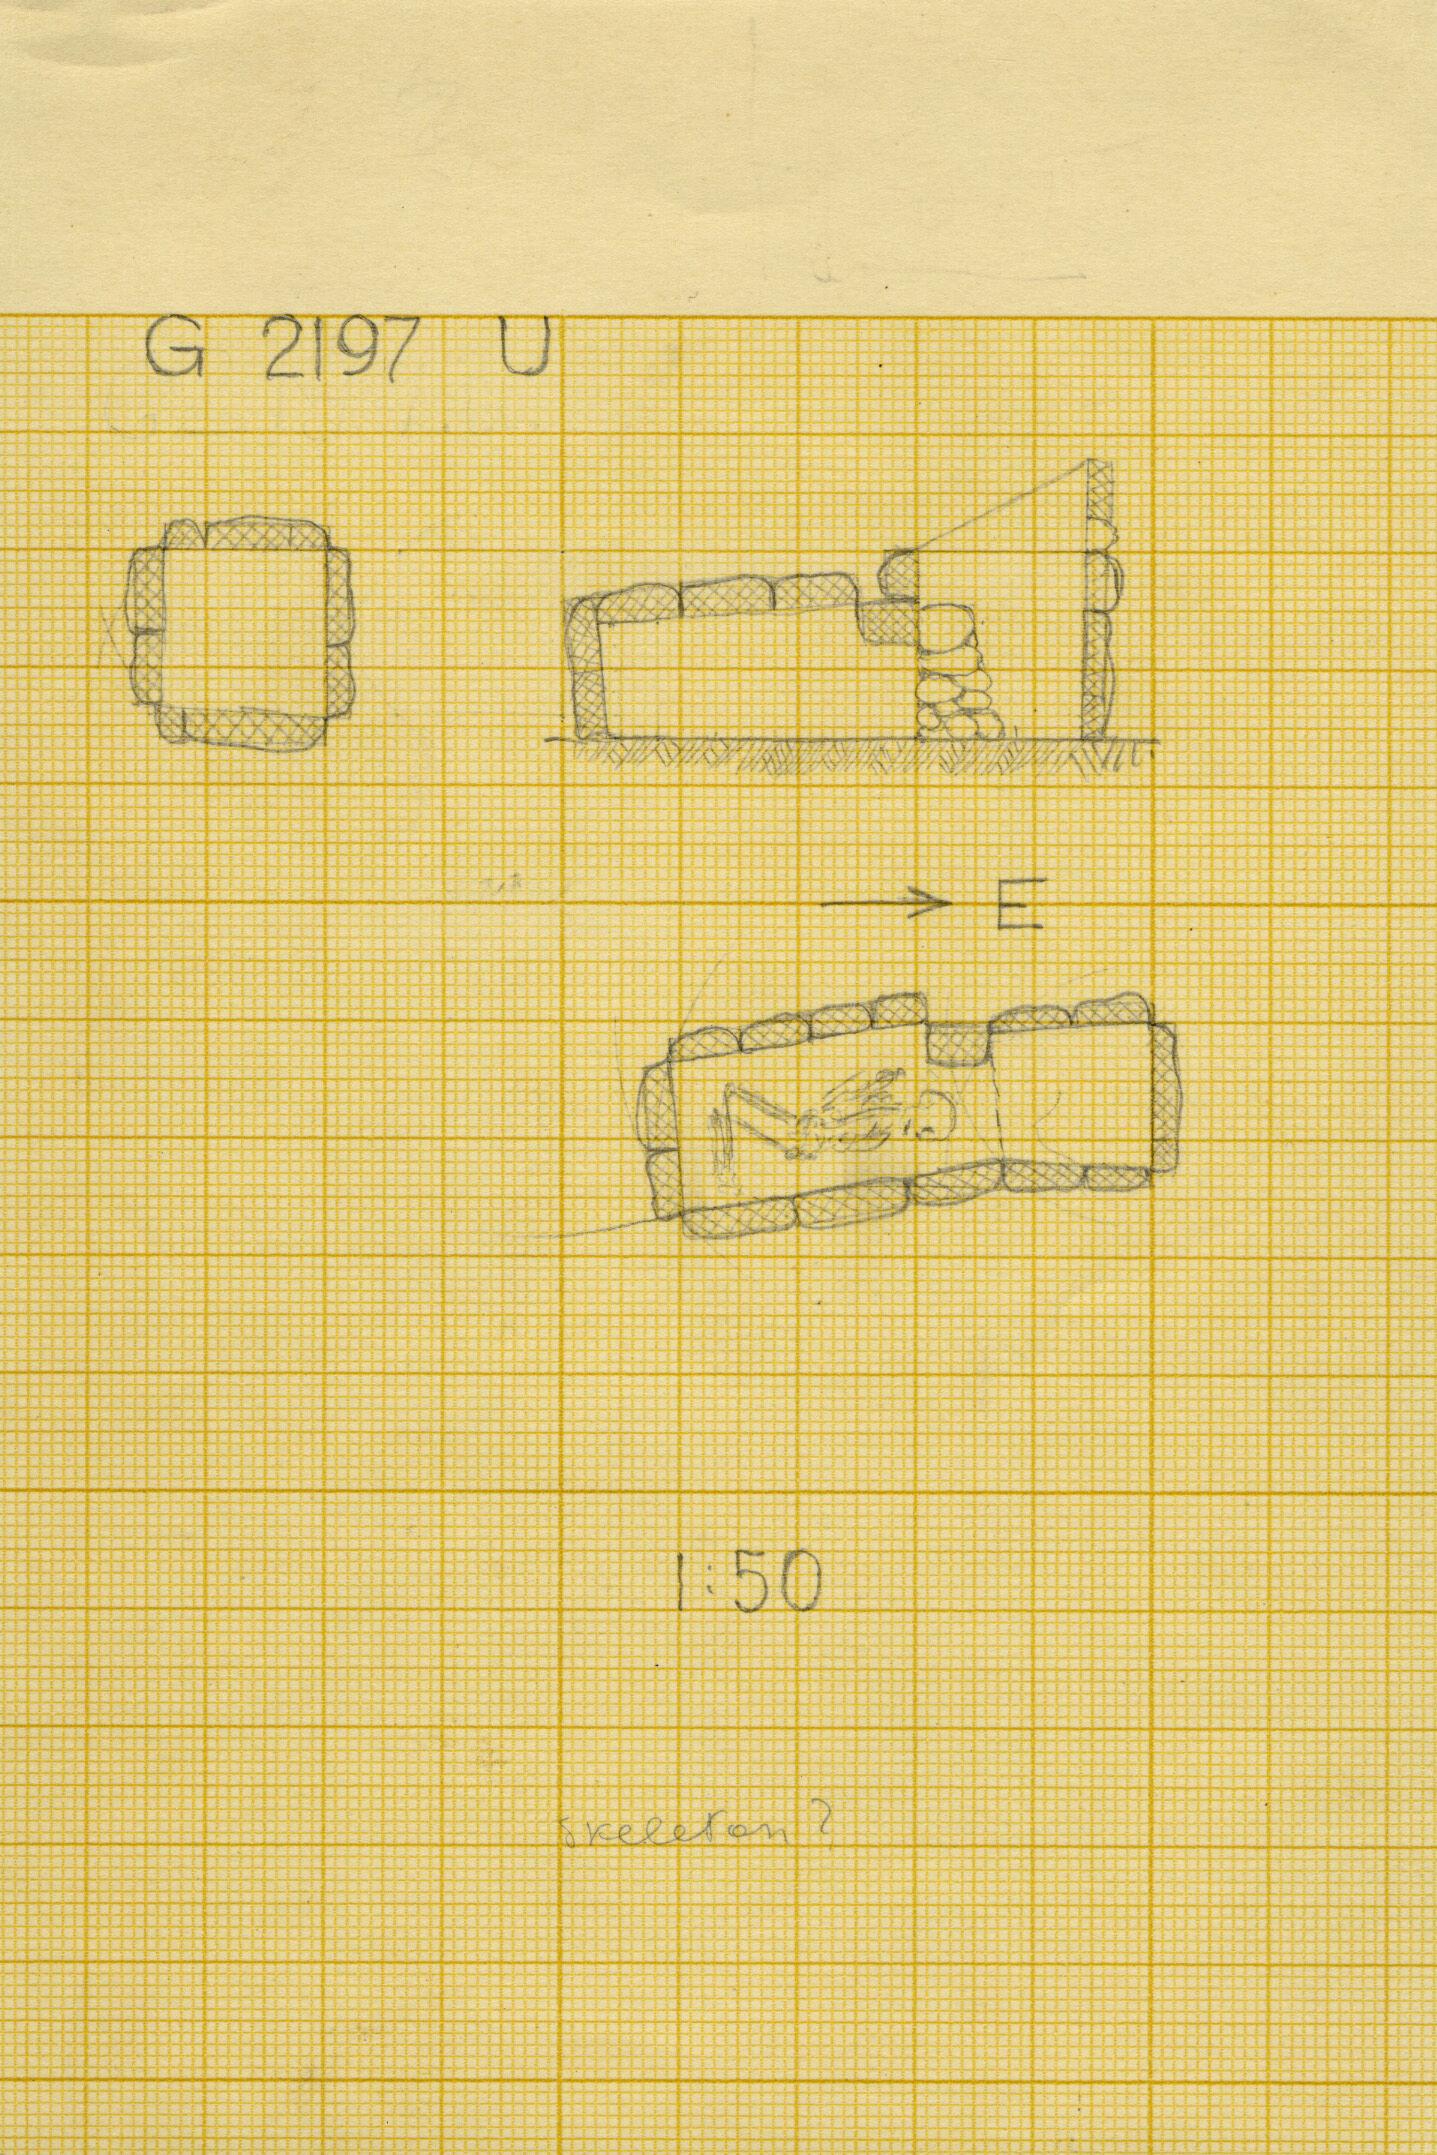 Maps and plans: G 2197, Shaft U